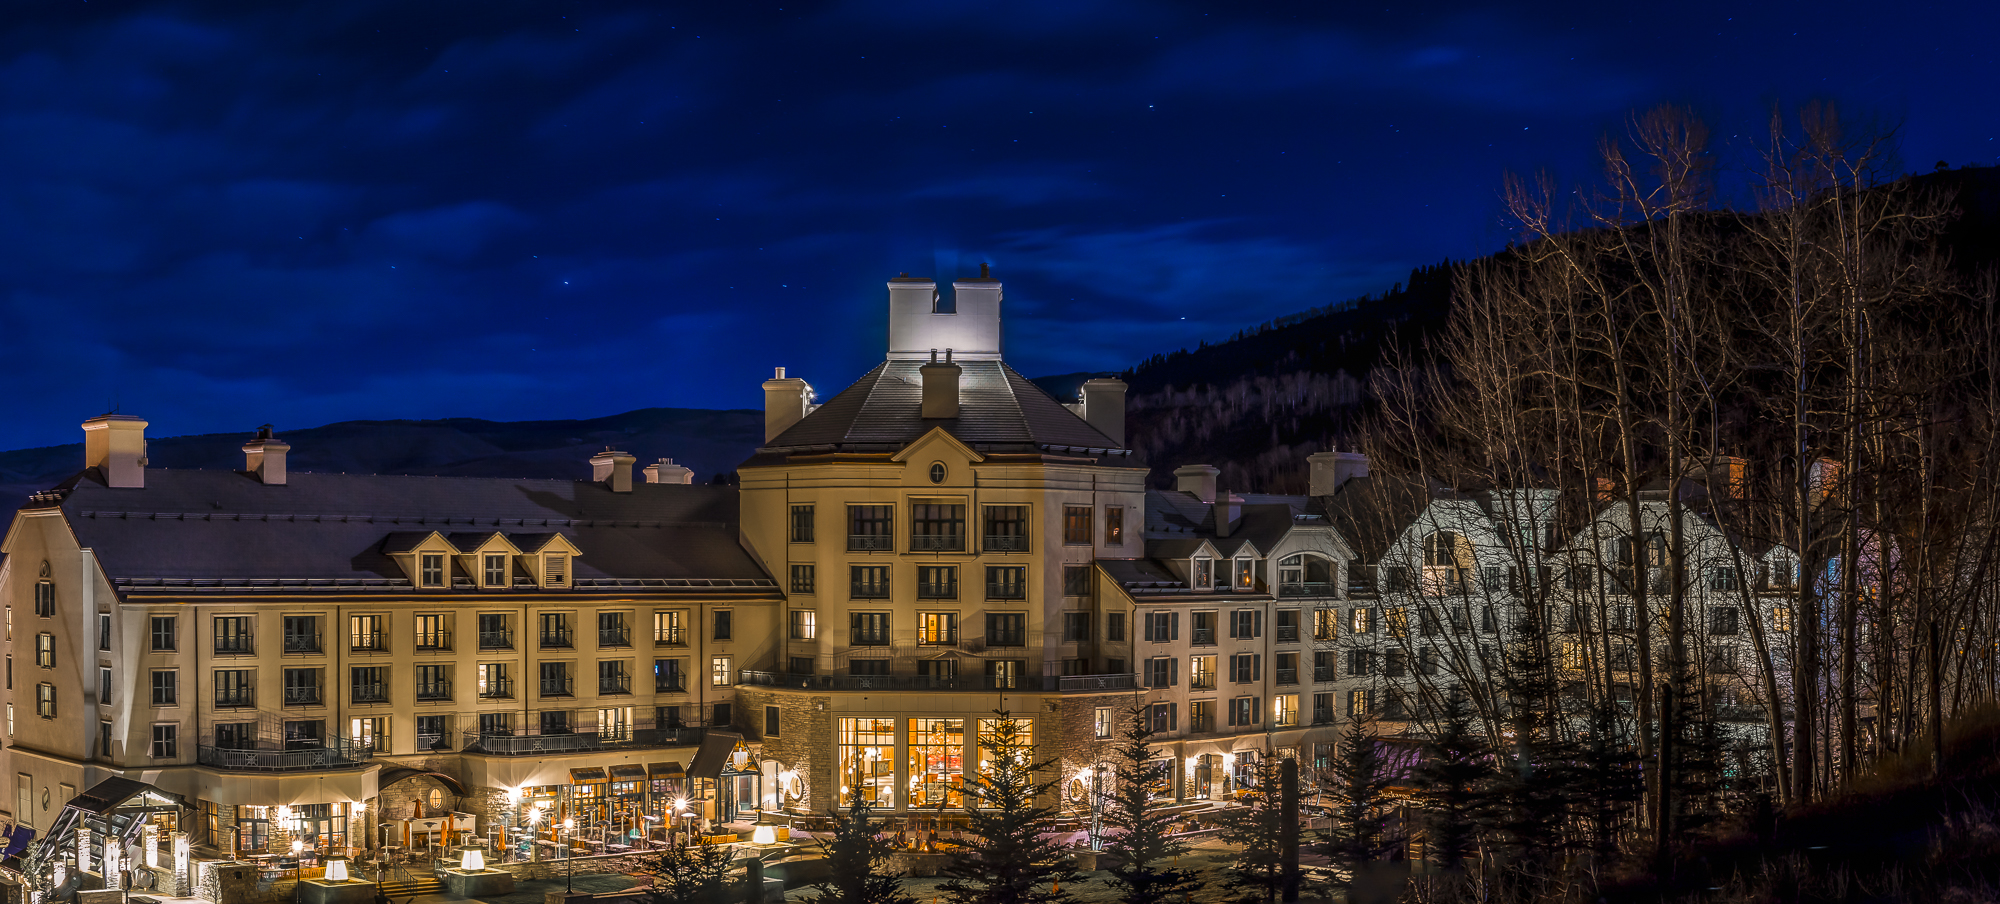 Hotels In Beaver Falls Pa